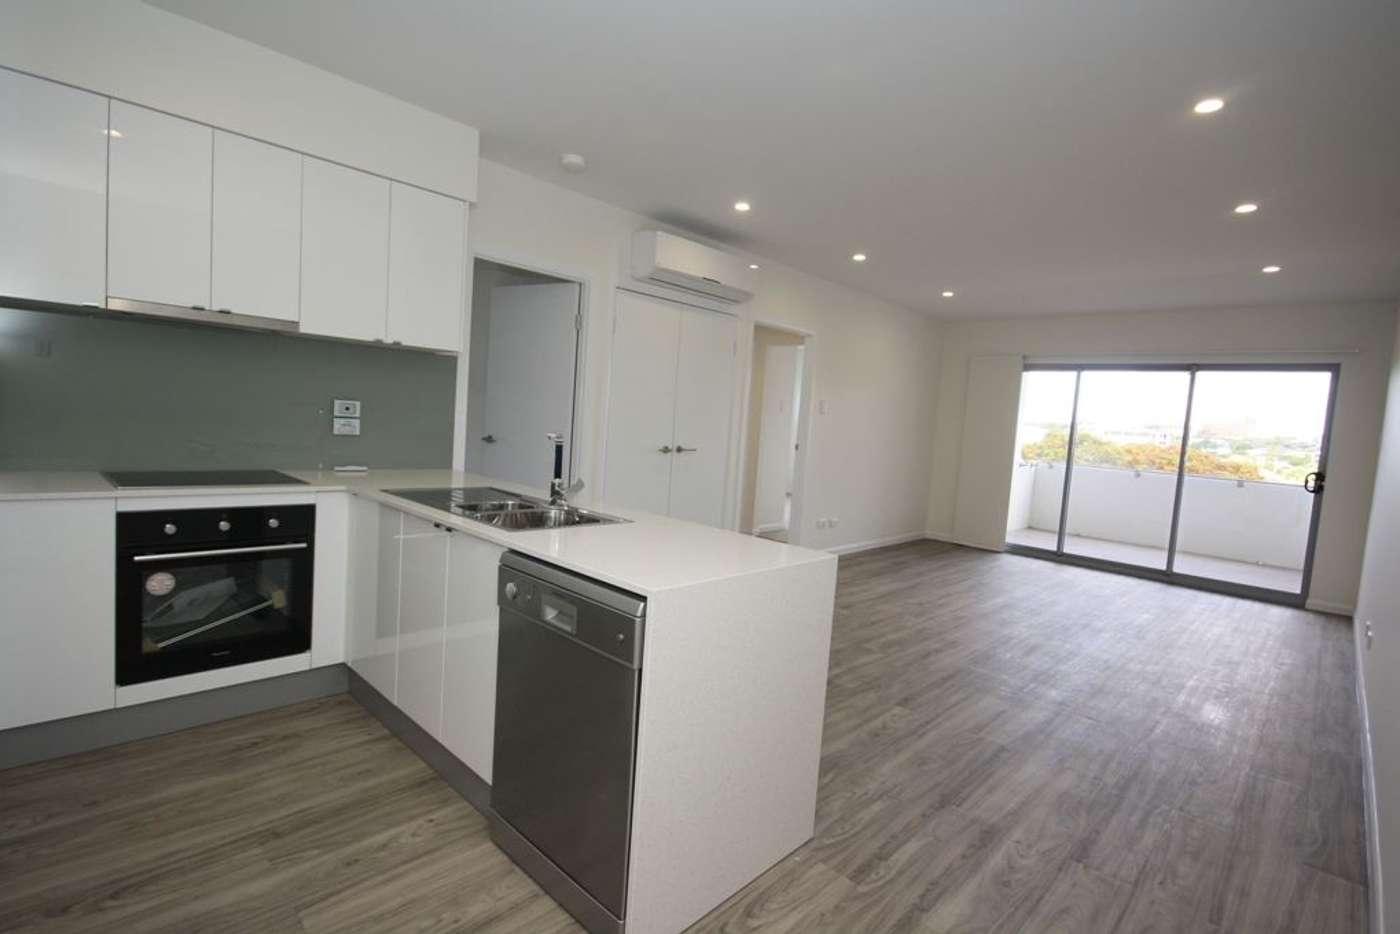 Main view of Homely unit listing, 2A/36 Buruda Street, Chermside QLD 4032